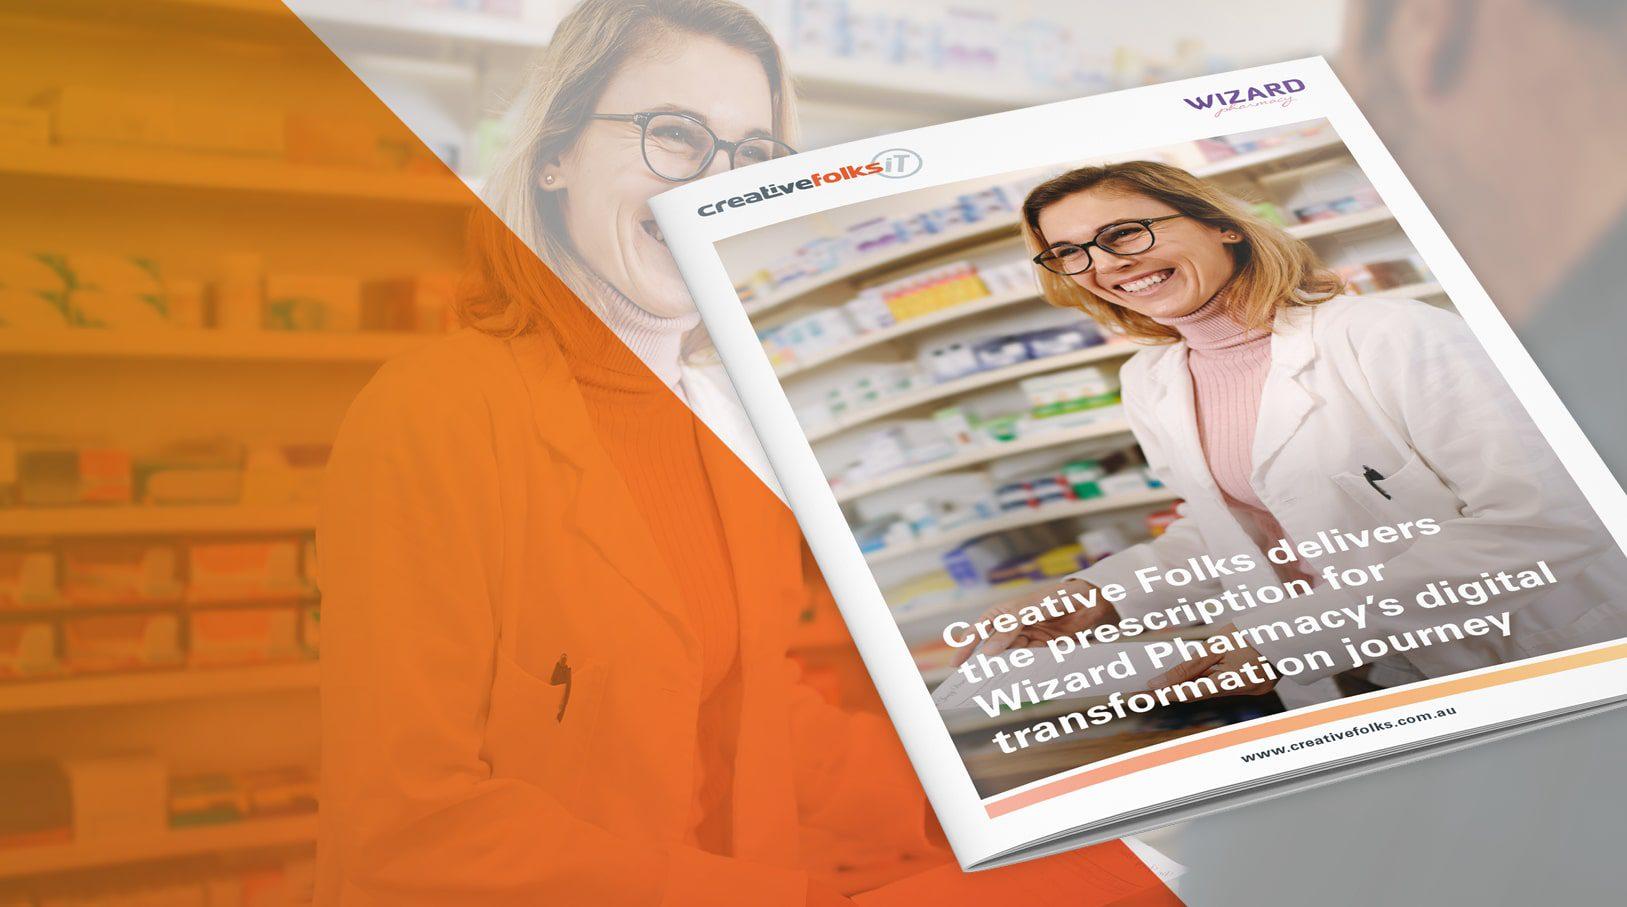 Creative Folks and Wizard Pharmacy Case Study